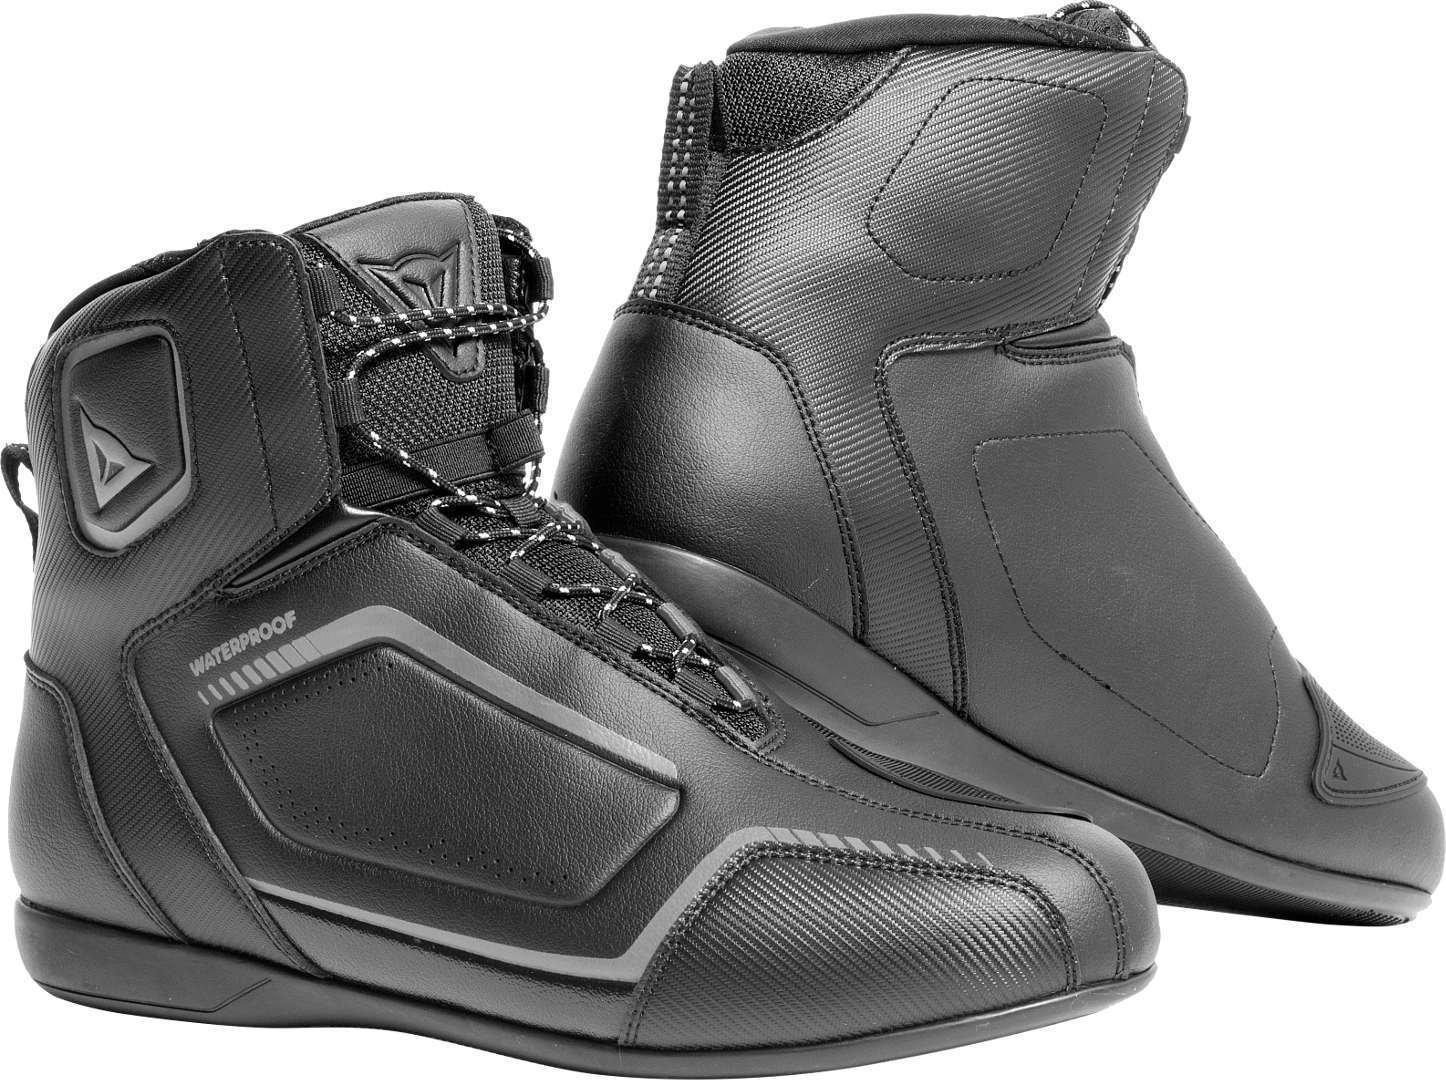 Raptors Lady D-WP Shoes Black Black Anthracite Dainese